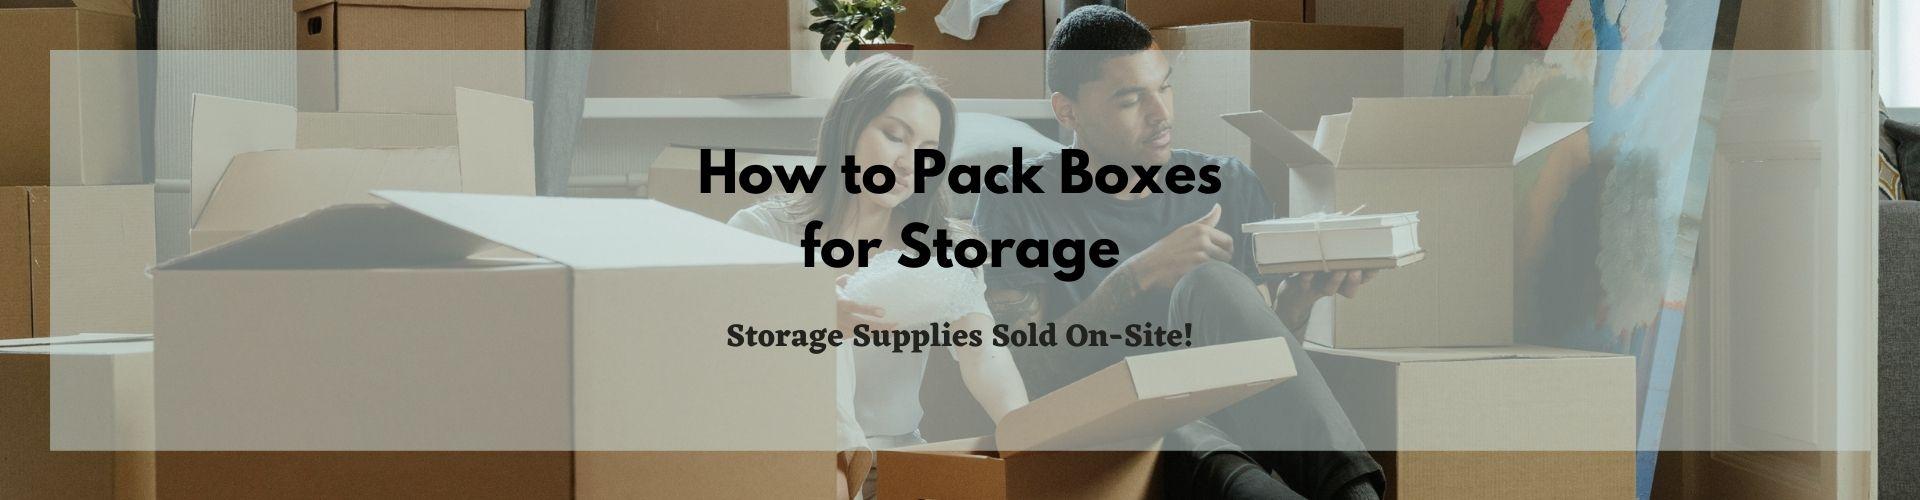 Storage Supplies Princeton NJ